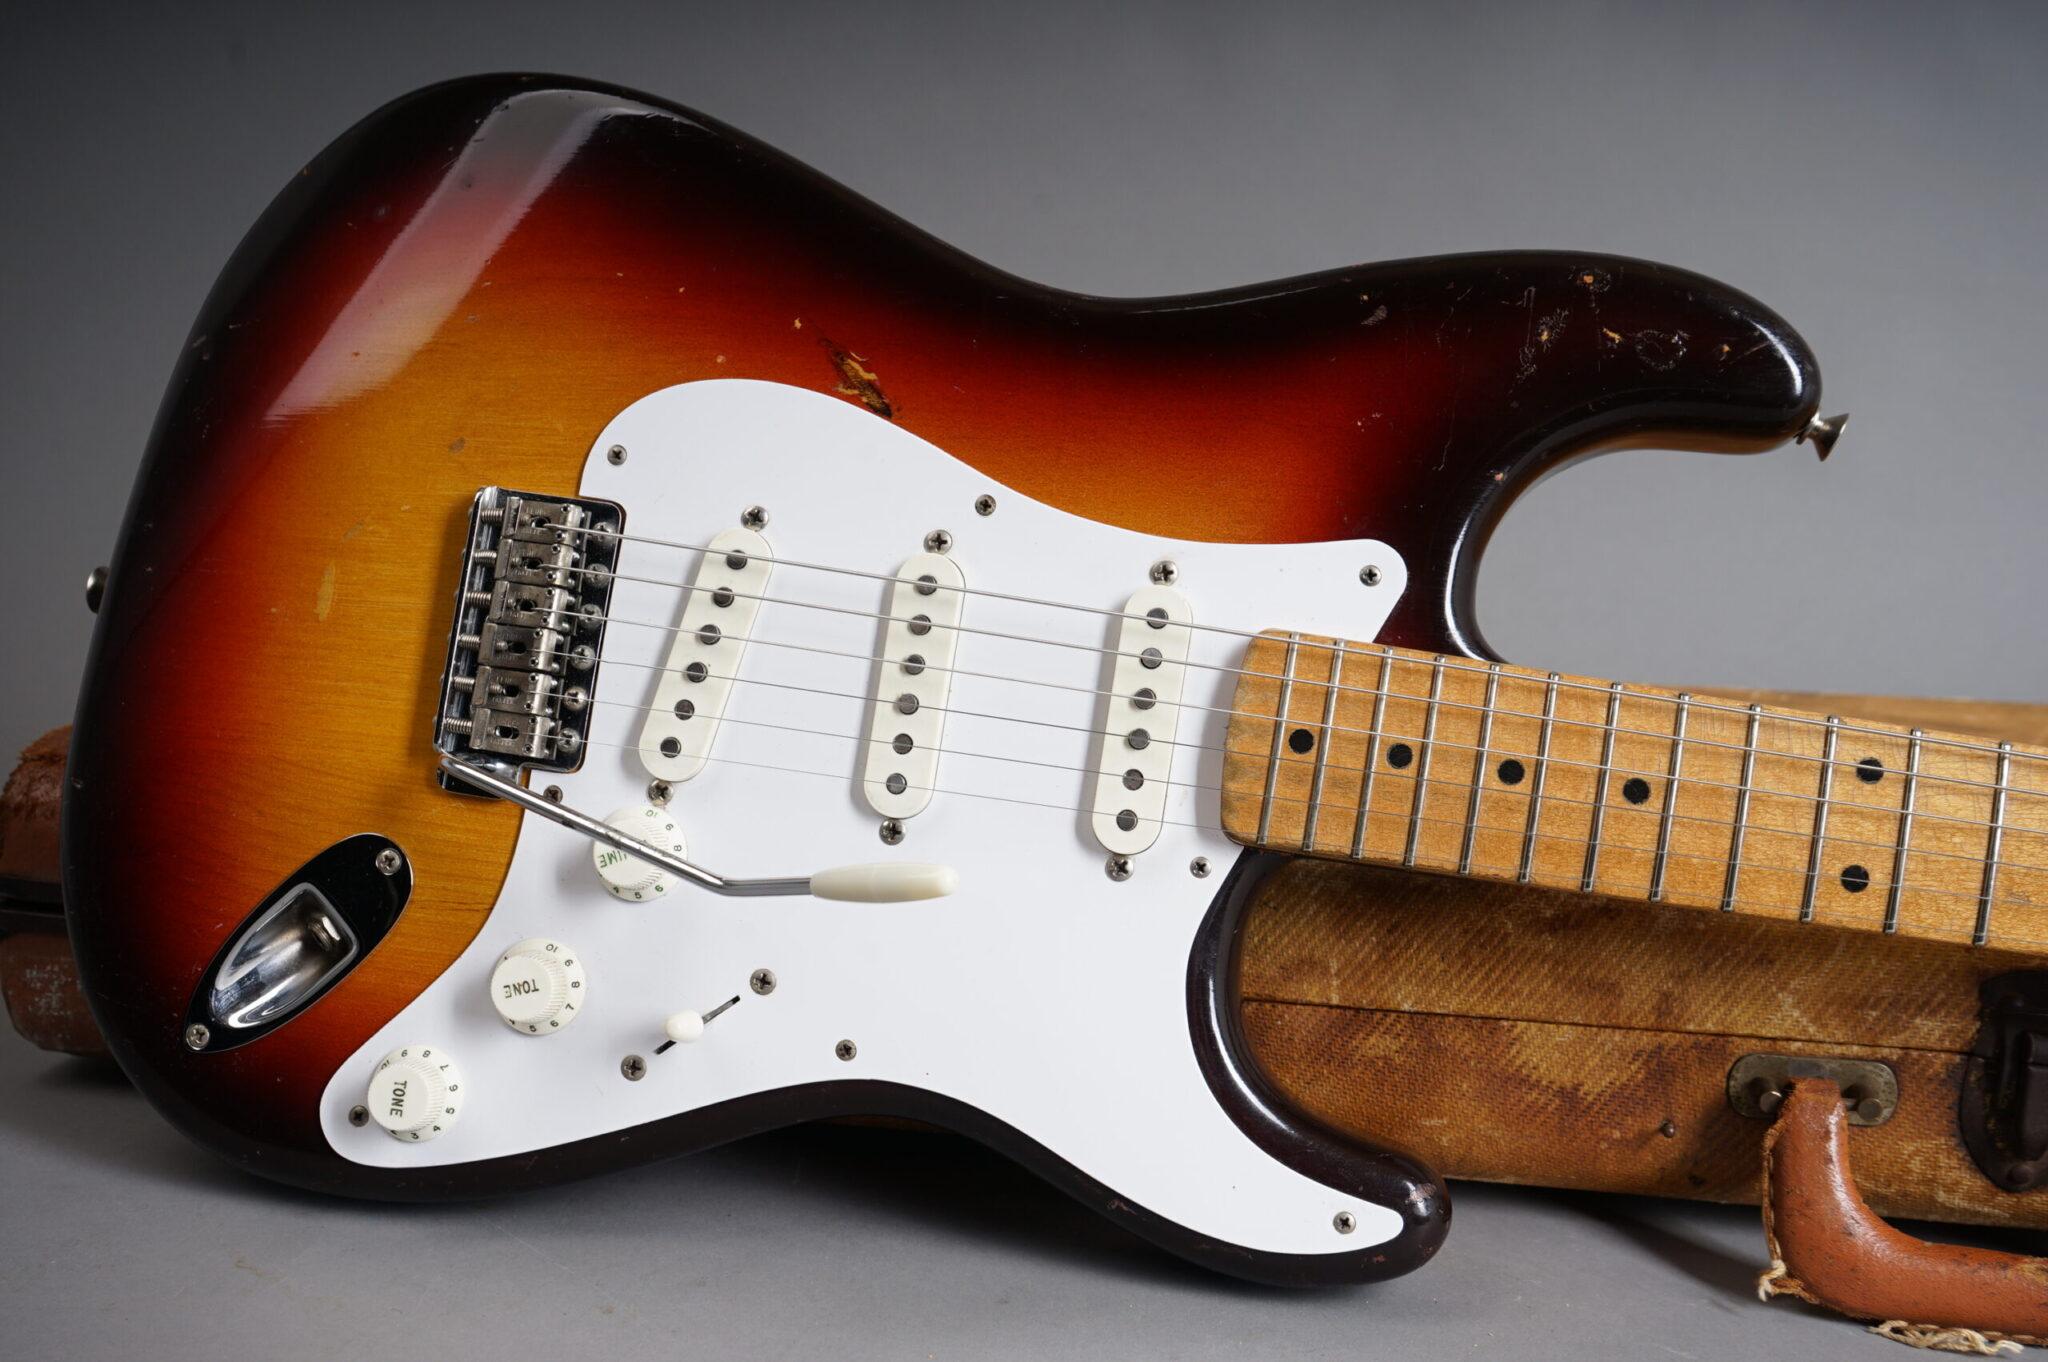 https://guitarpoint.de/app/uploads/products/1958-fender-stratocaster-sunburst/1958-Fender-Stratocaster-Sunburst-027789-9-scaled-2048x1362.jpg